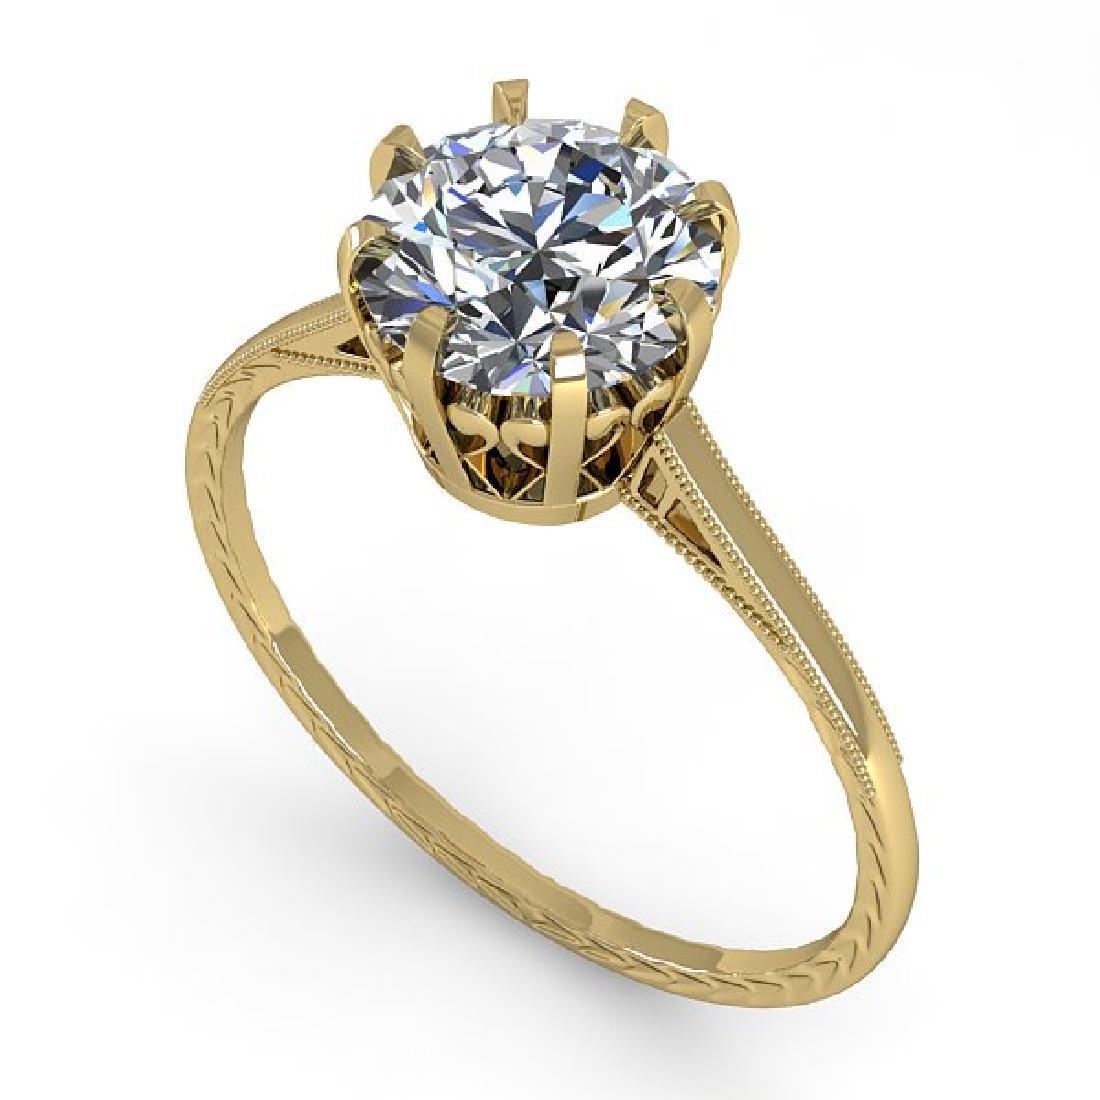 1.51 CTW Certified VS/SI Diamond Ring 14K Yellow Gold - 2